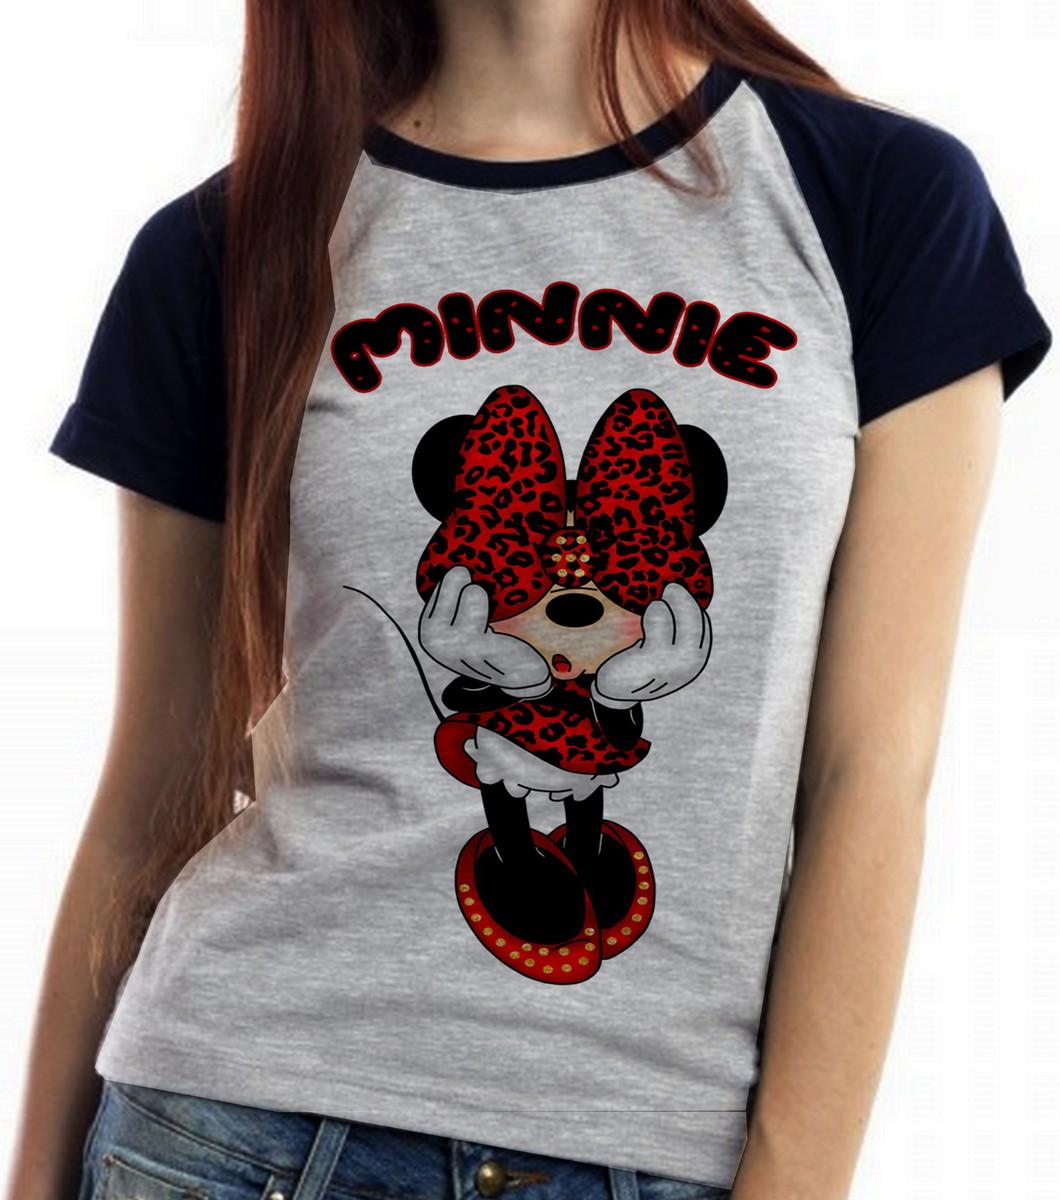 9e2da91d8c blusa feminina baby look Minnie mouse tope rmickey disney no Elo7 ...